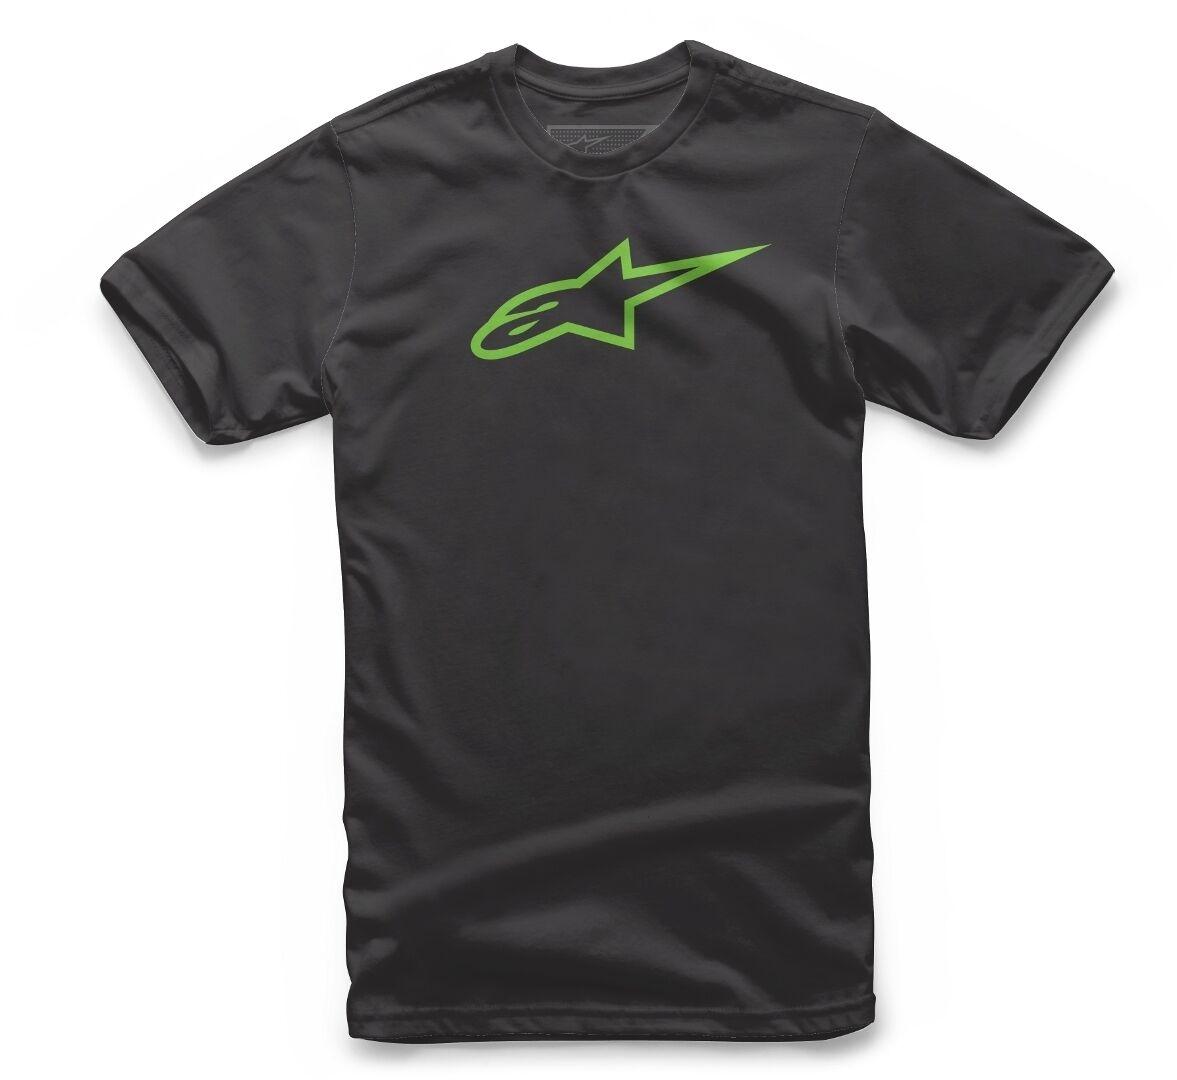 Alpinestars Ageless Tee Kids T-Shirt unisex Black White Size: S